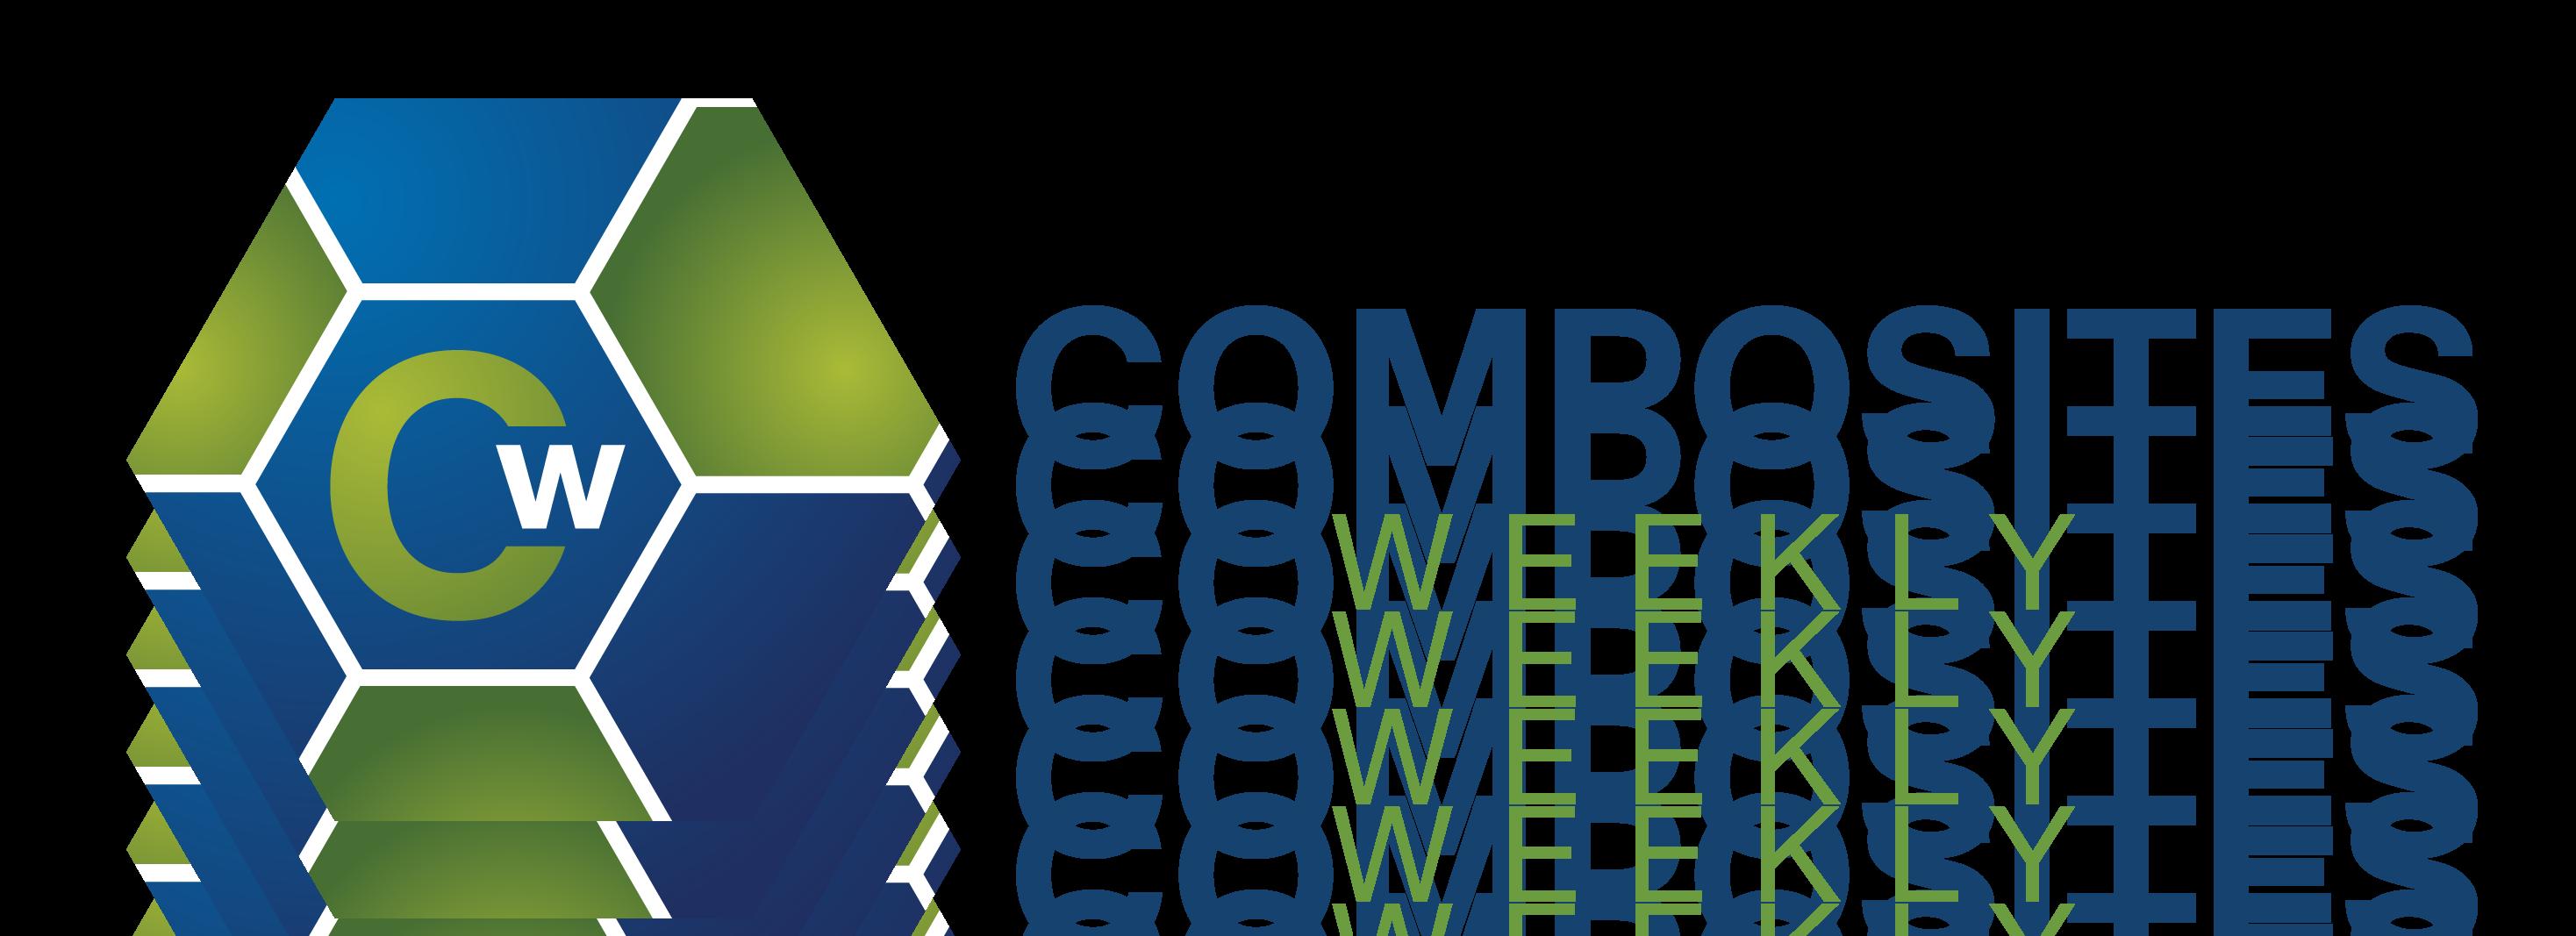 Composites Weekly